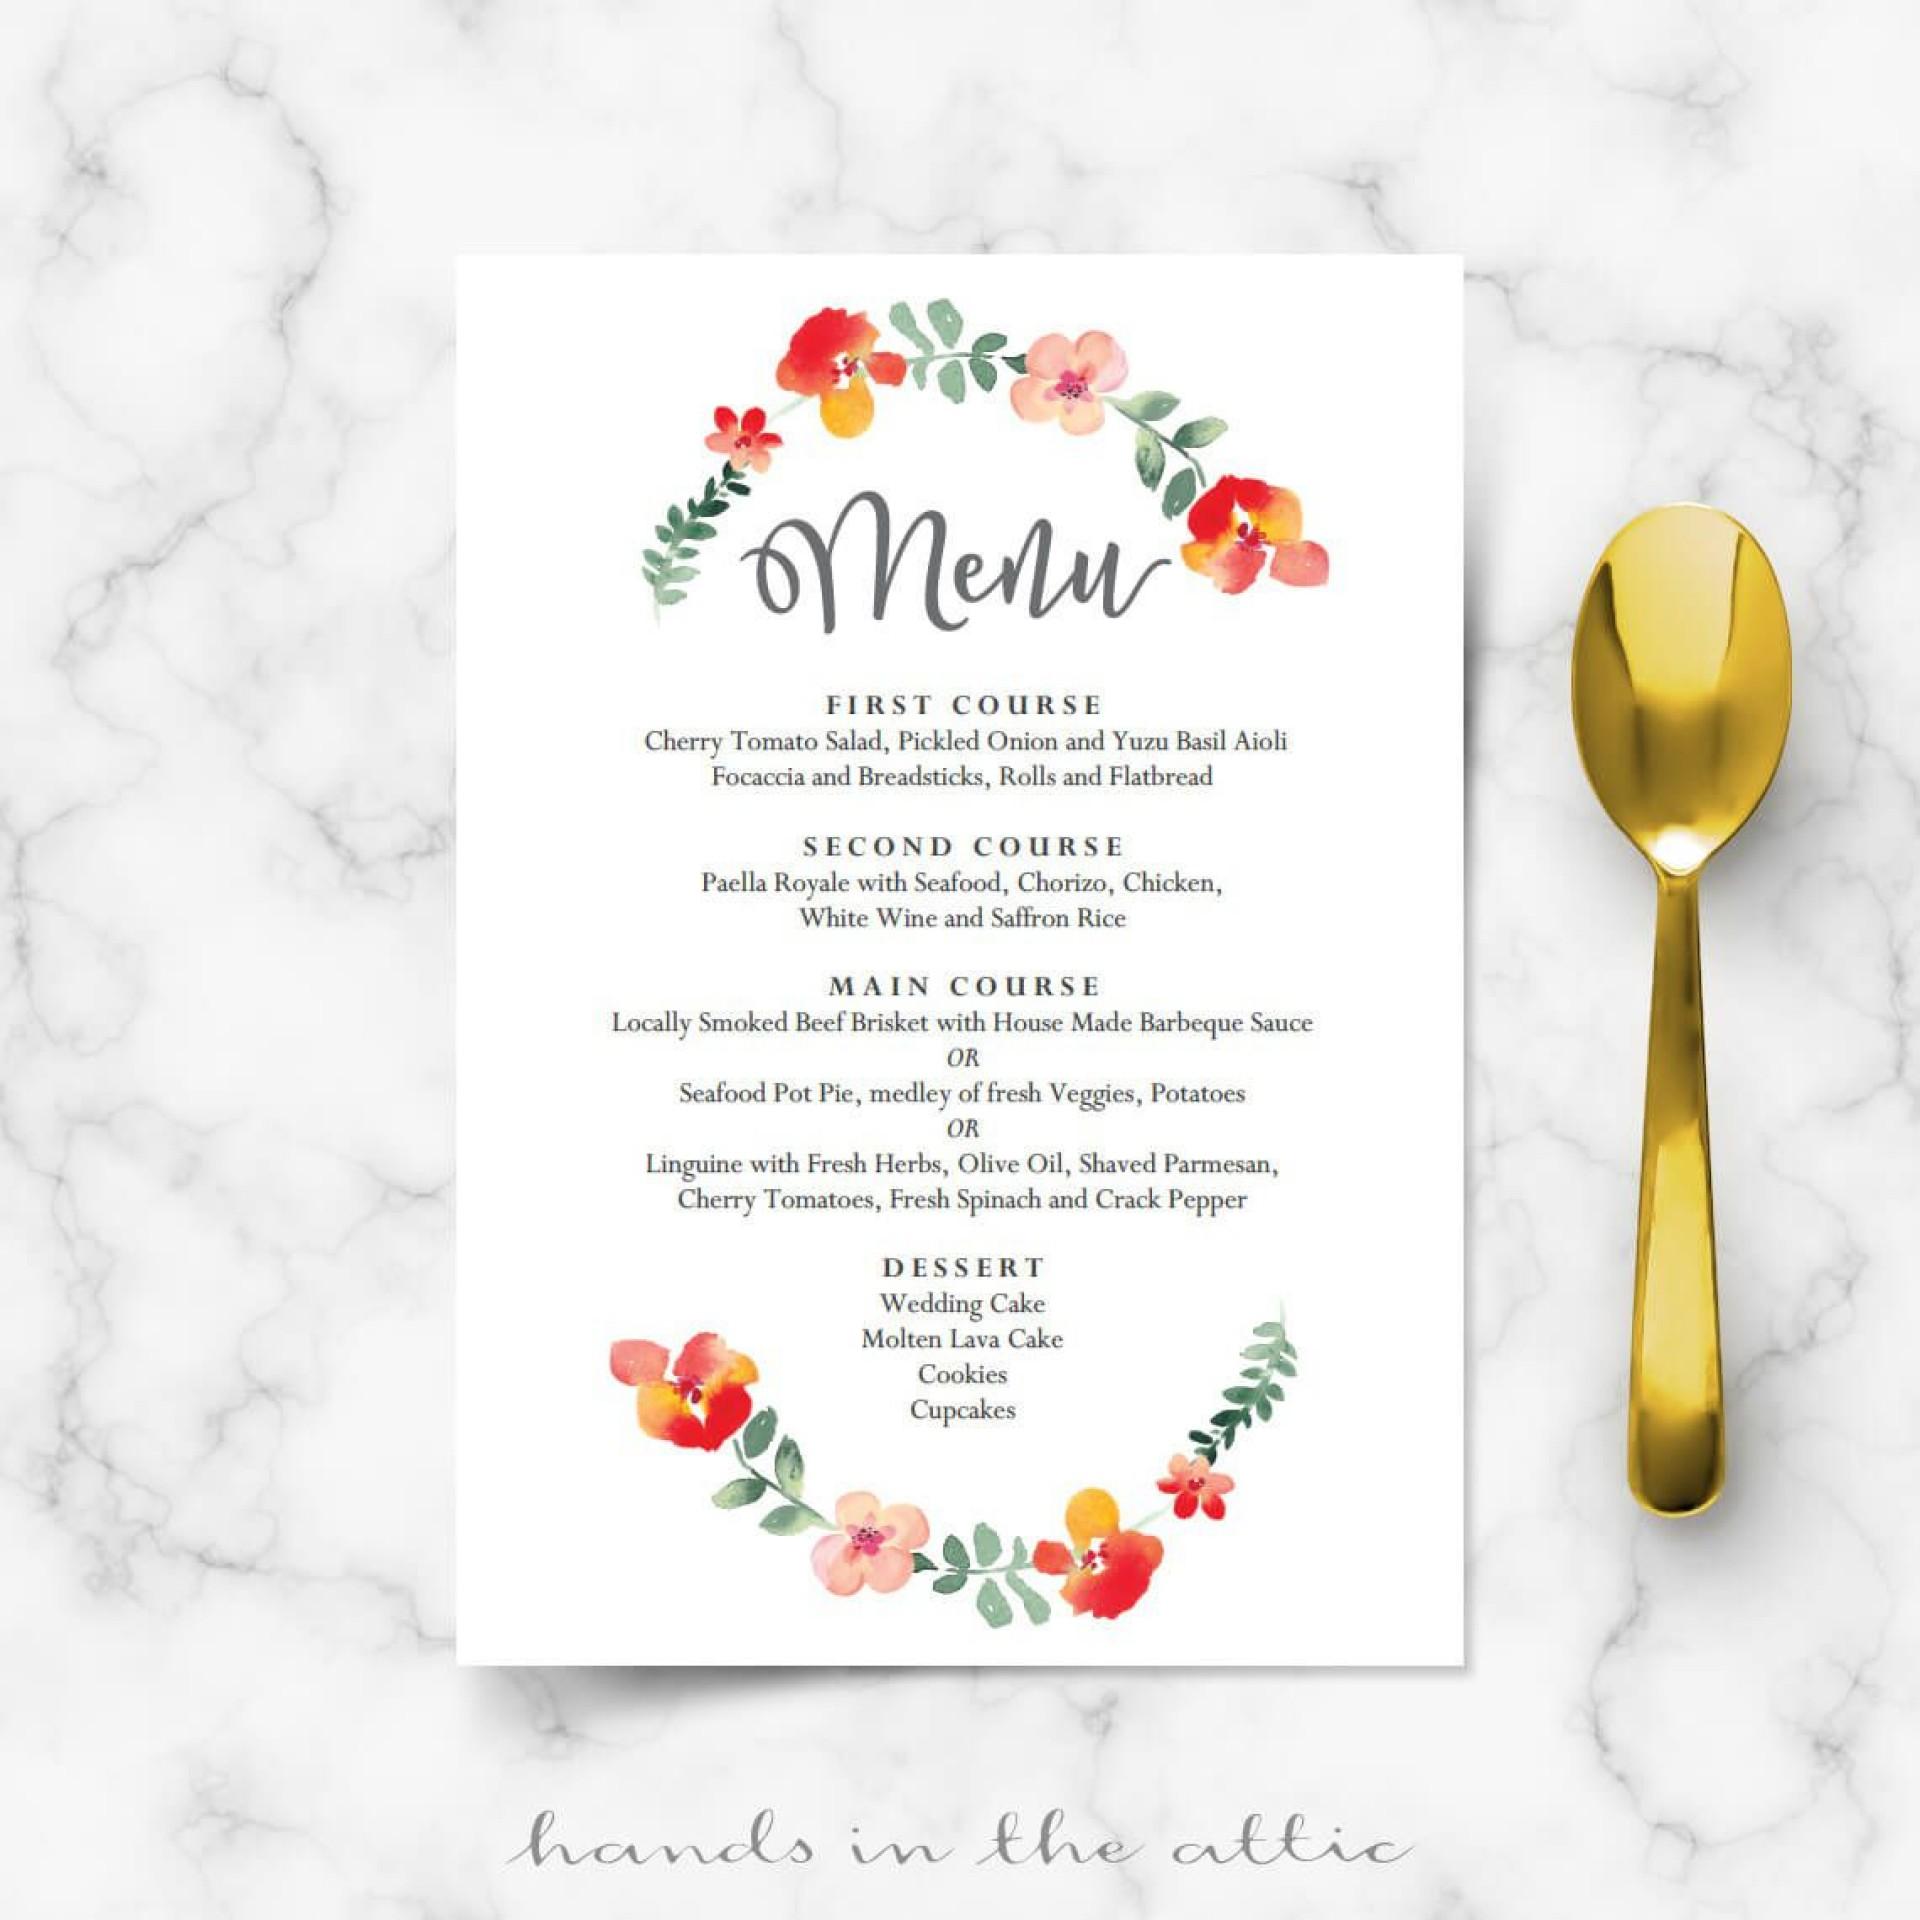 008 Unforgettable Diy Wedding Menu Template Idea  Free Card1920